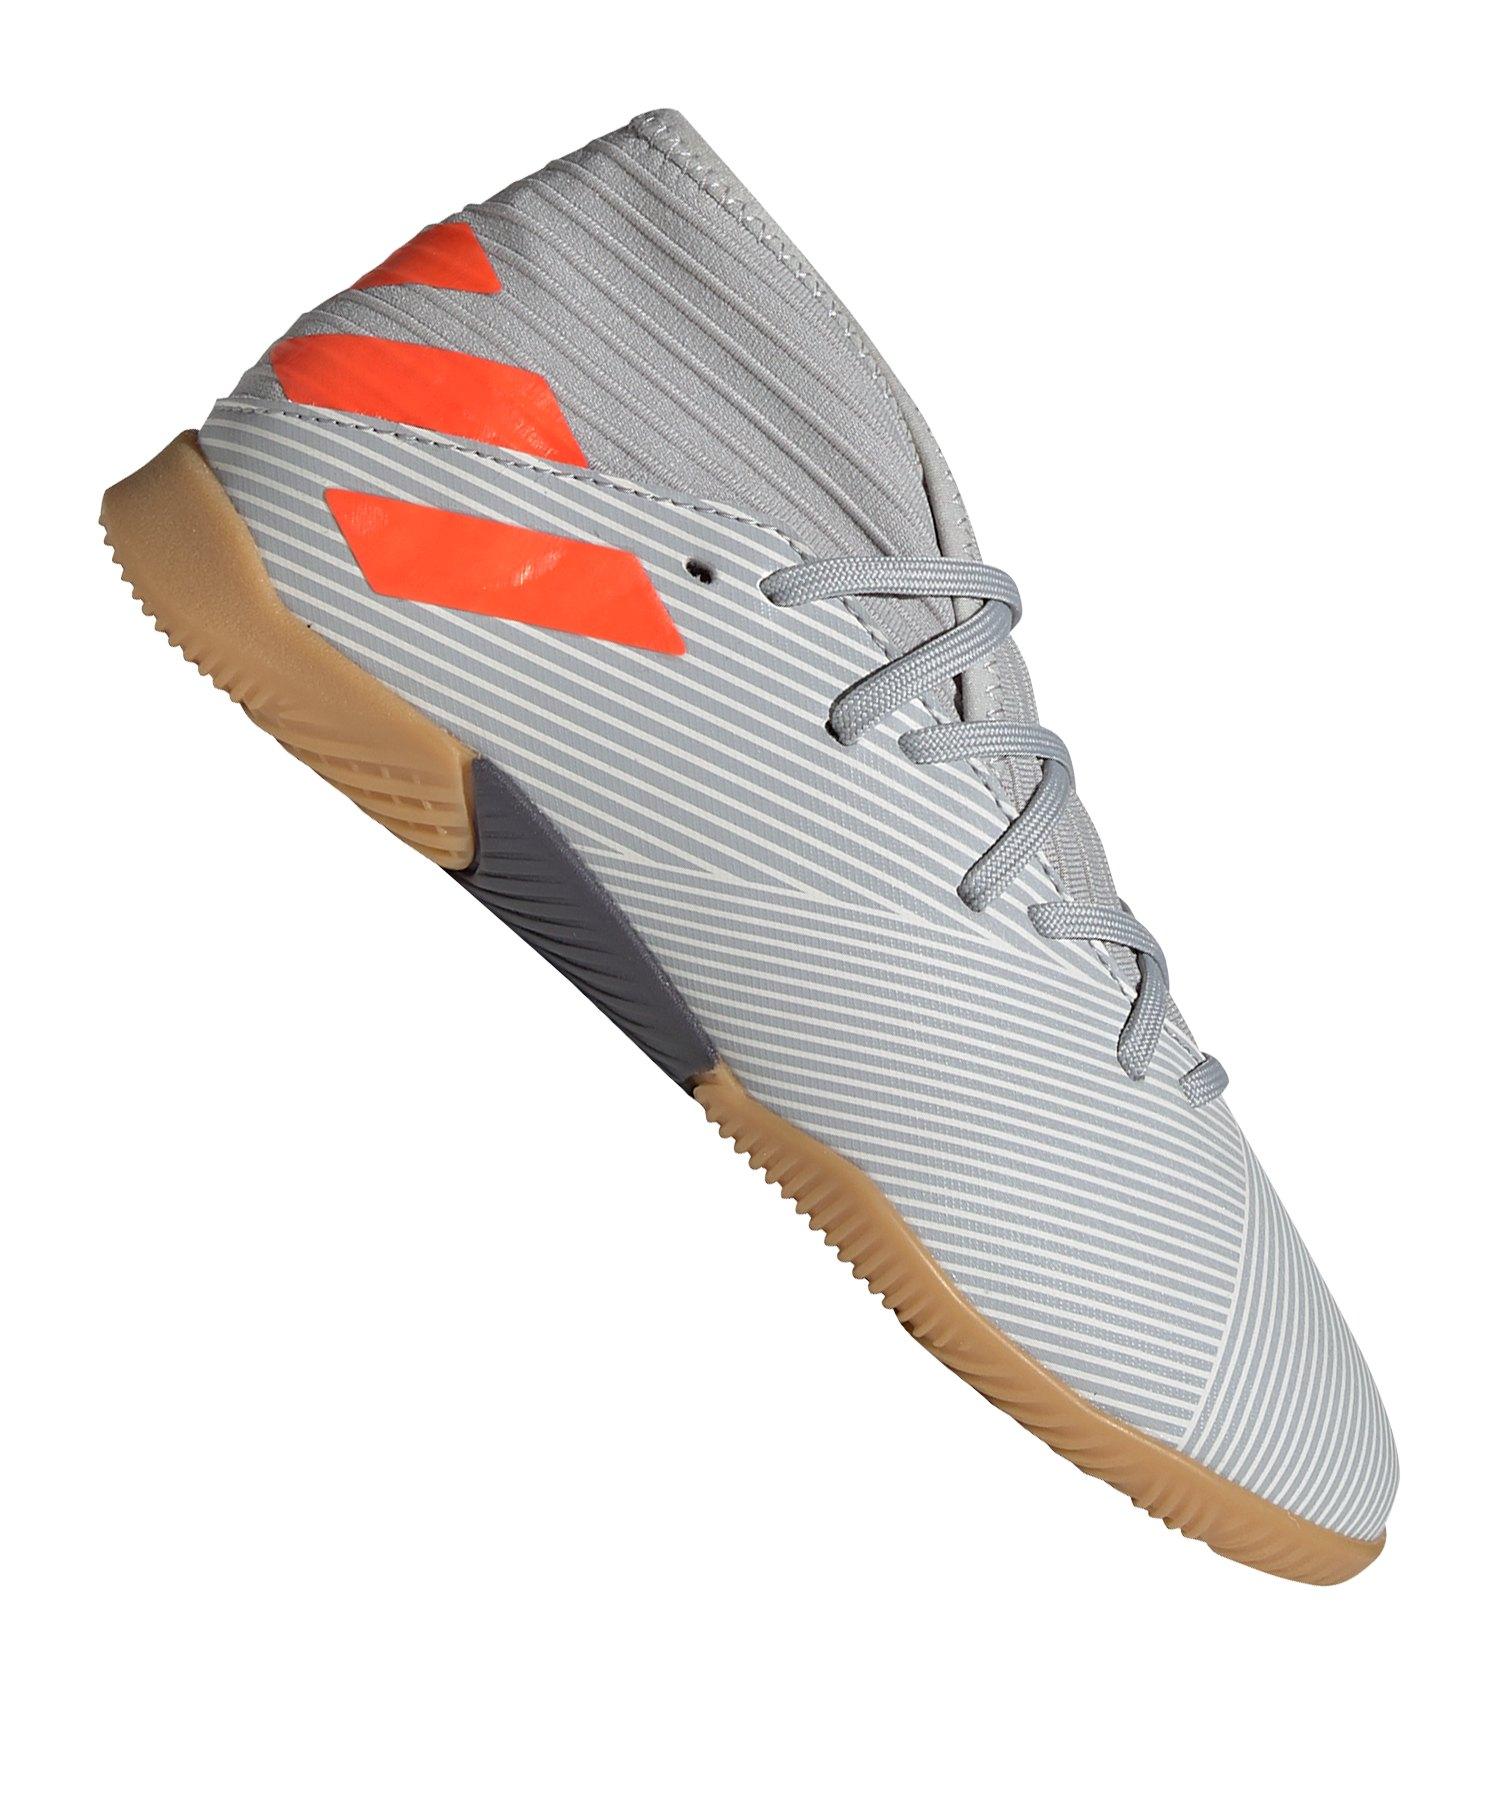 adidas NEMEZIZ 19.3 IN Halle J Kids Grau Orange - grau